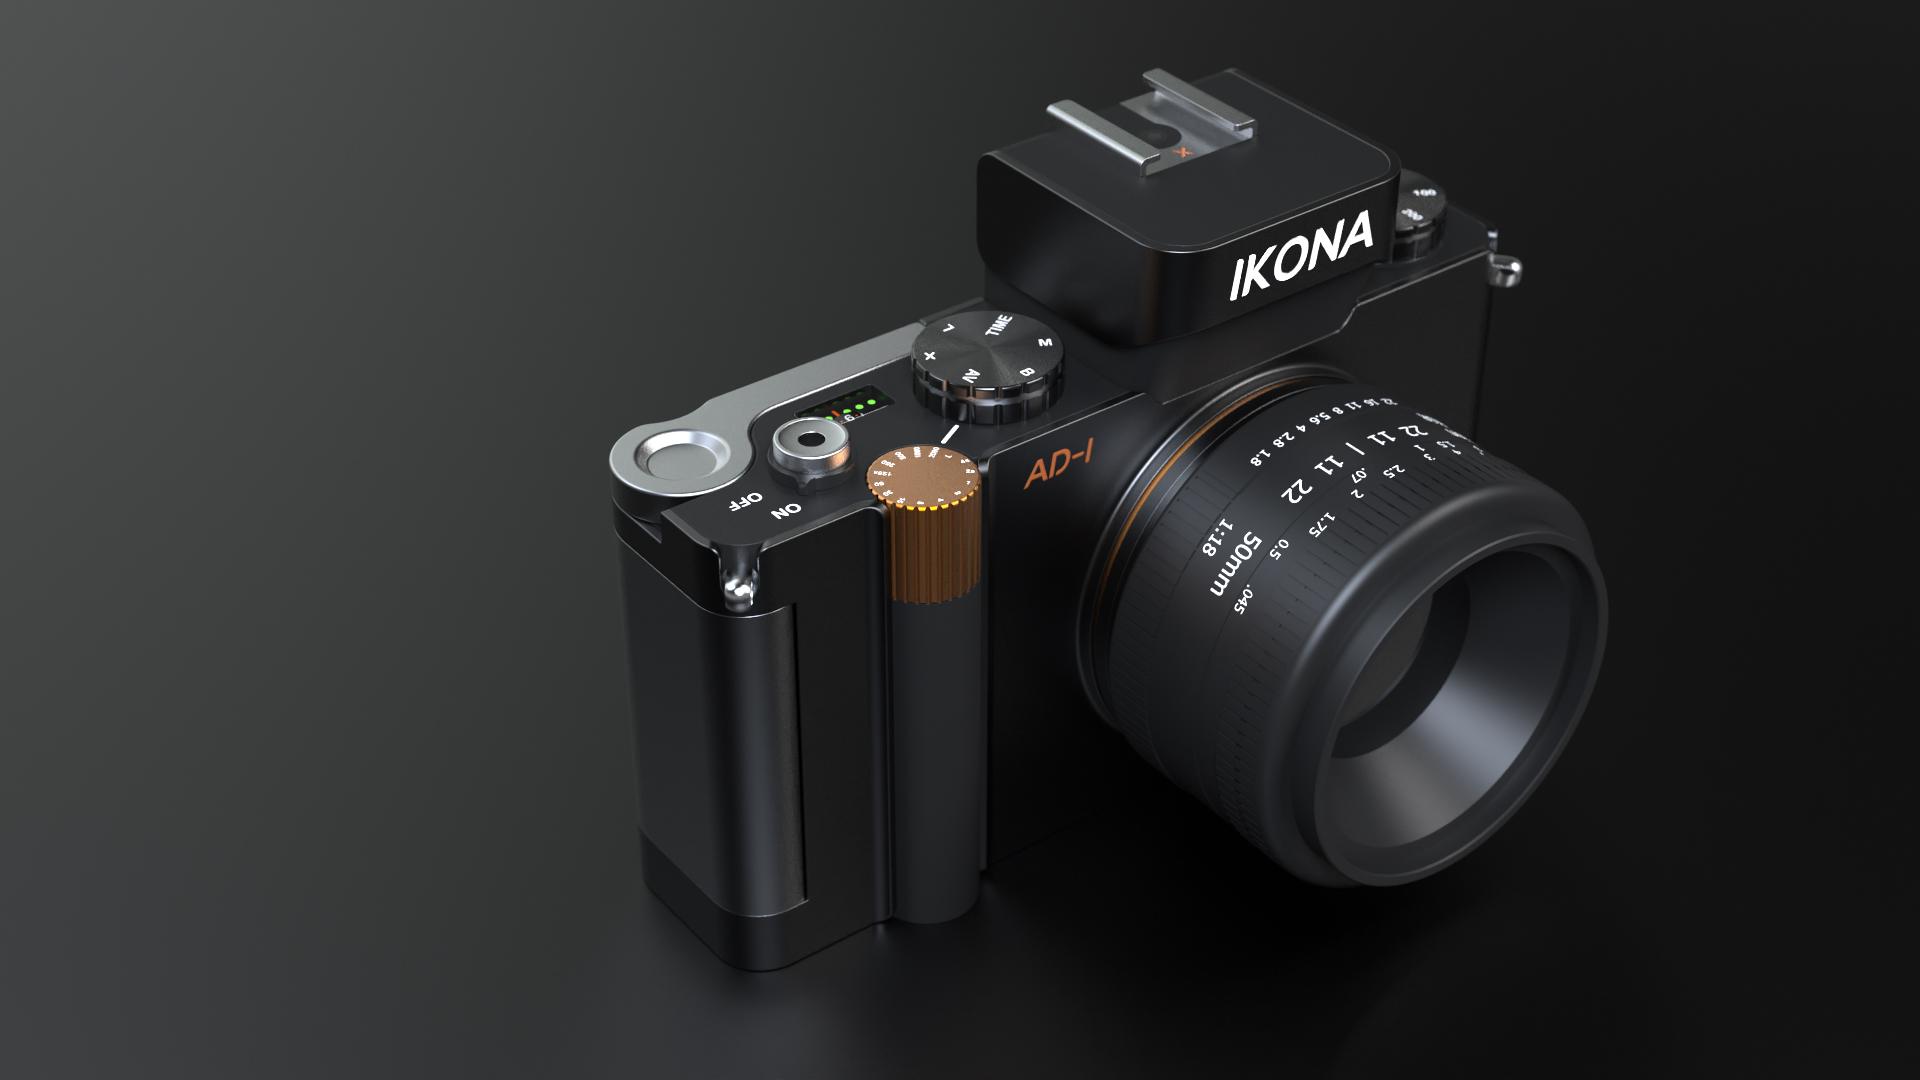 IKONA Hybridkamera